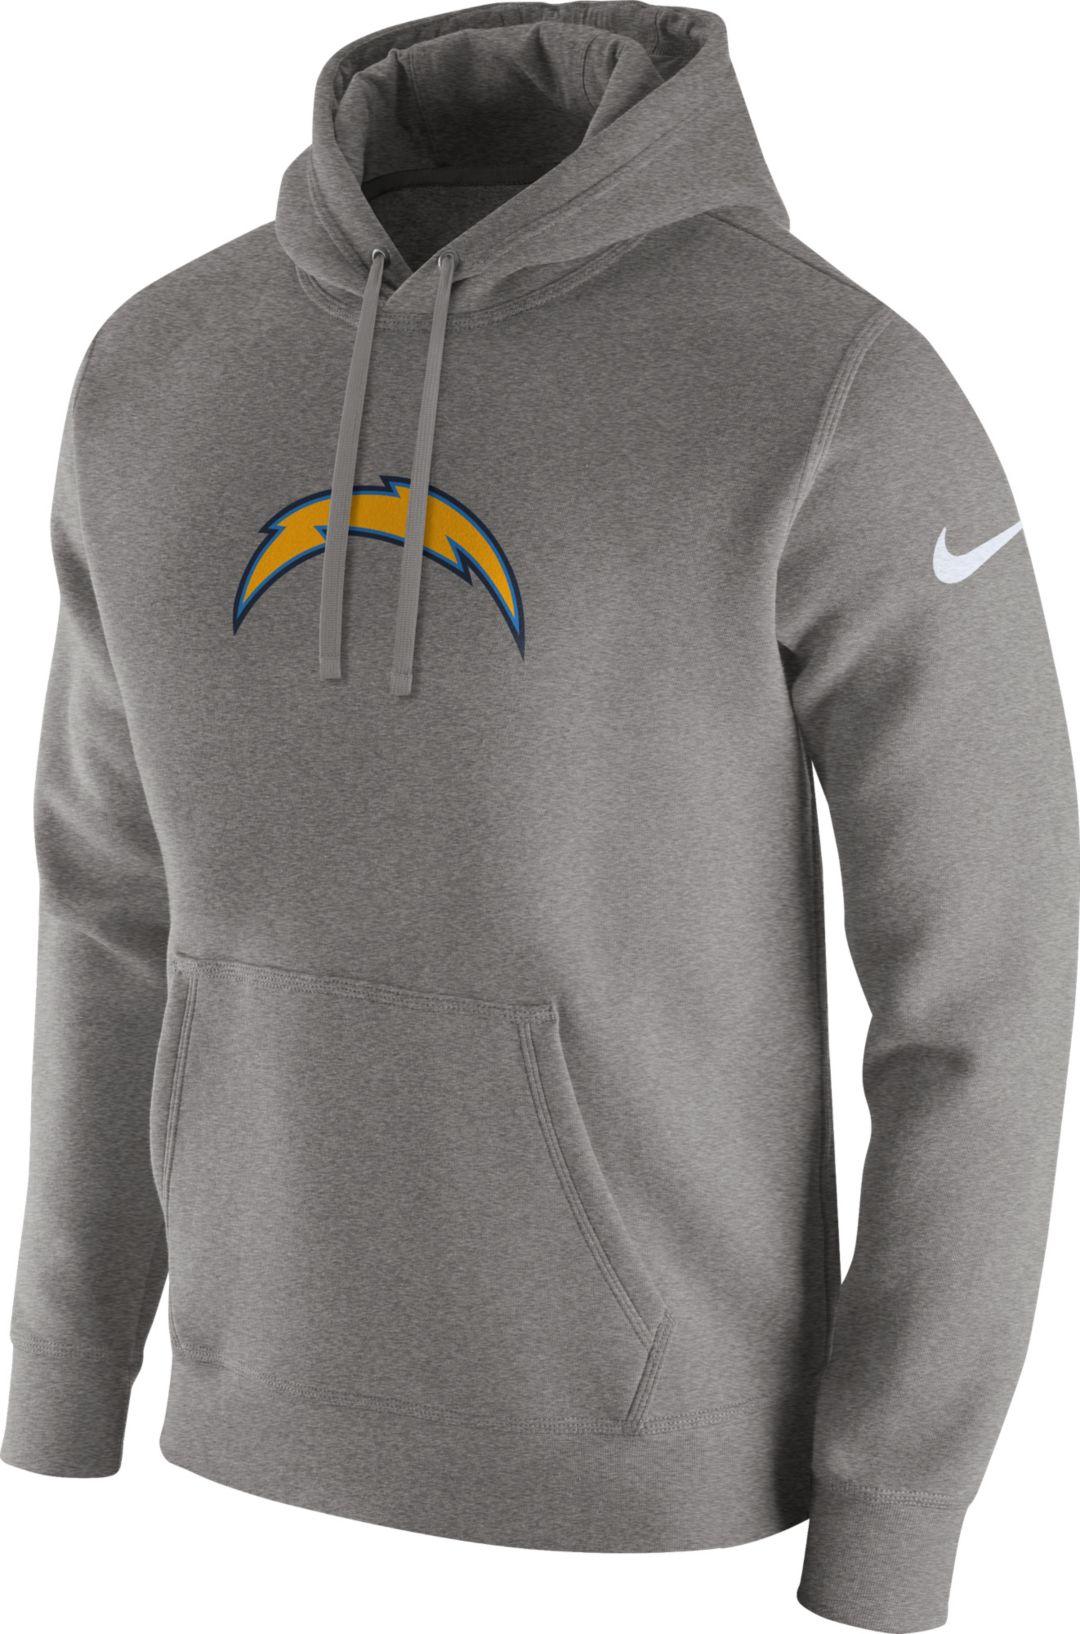 huge discount 793de 814e7 Nike Men's Los Angeles Chargers Logo Club Grey Hoodie